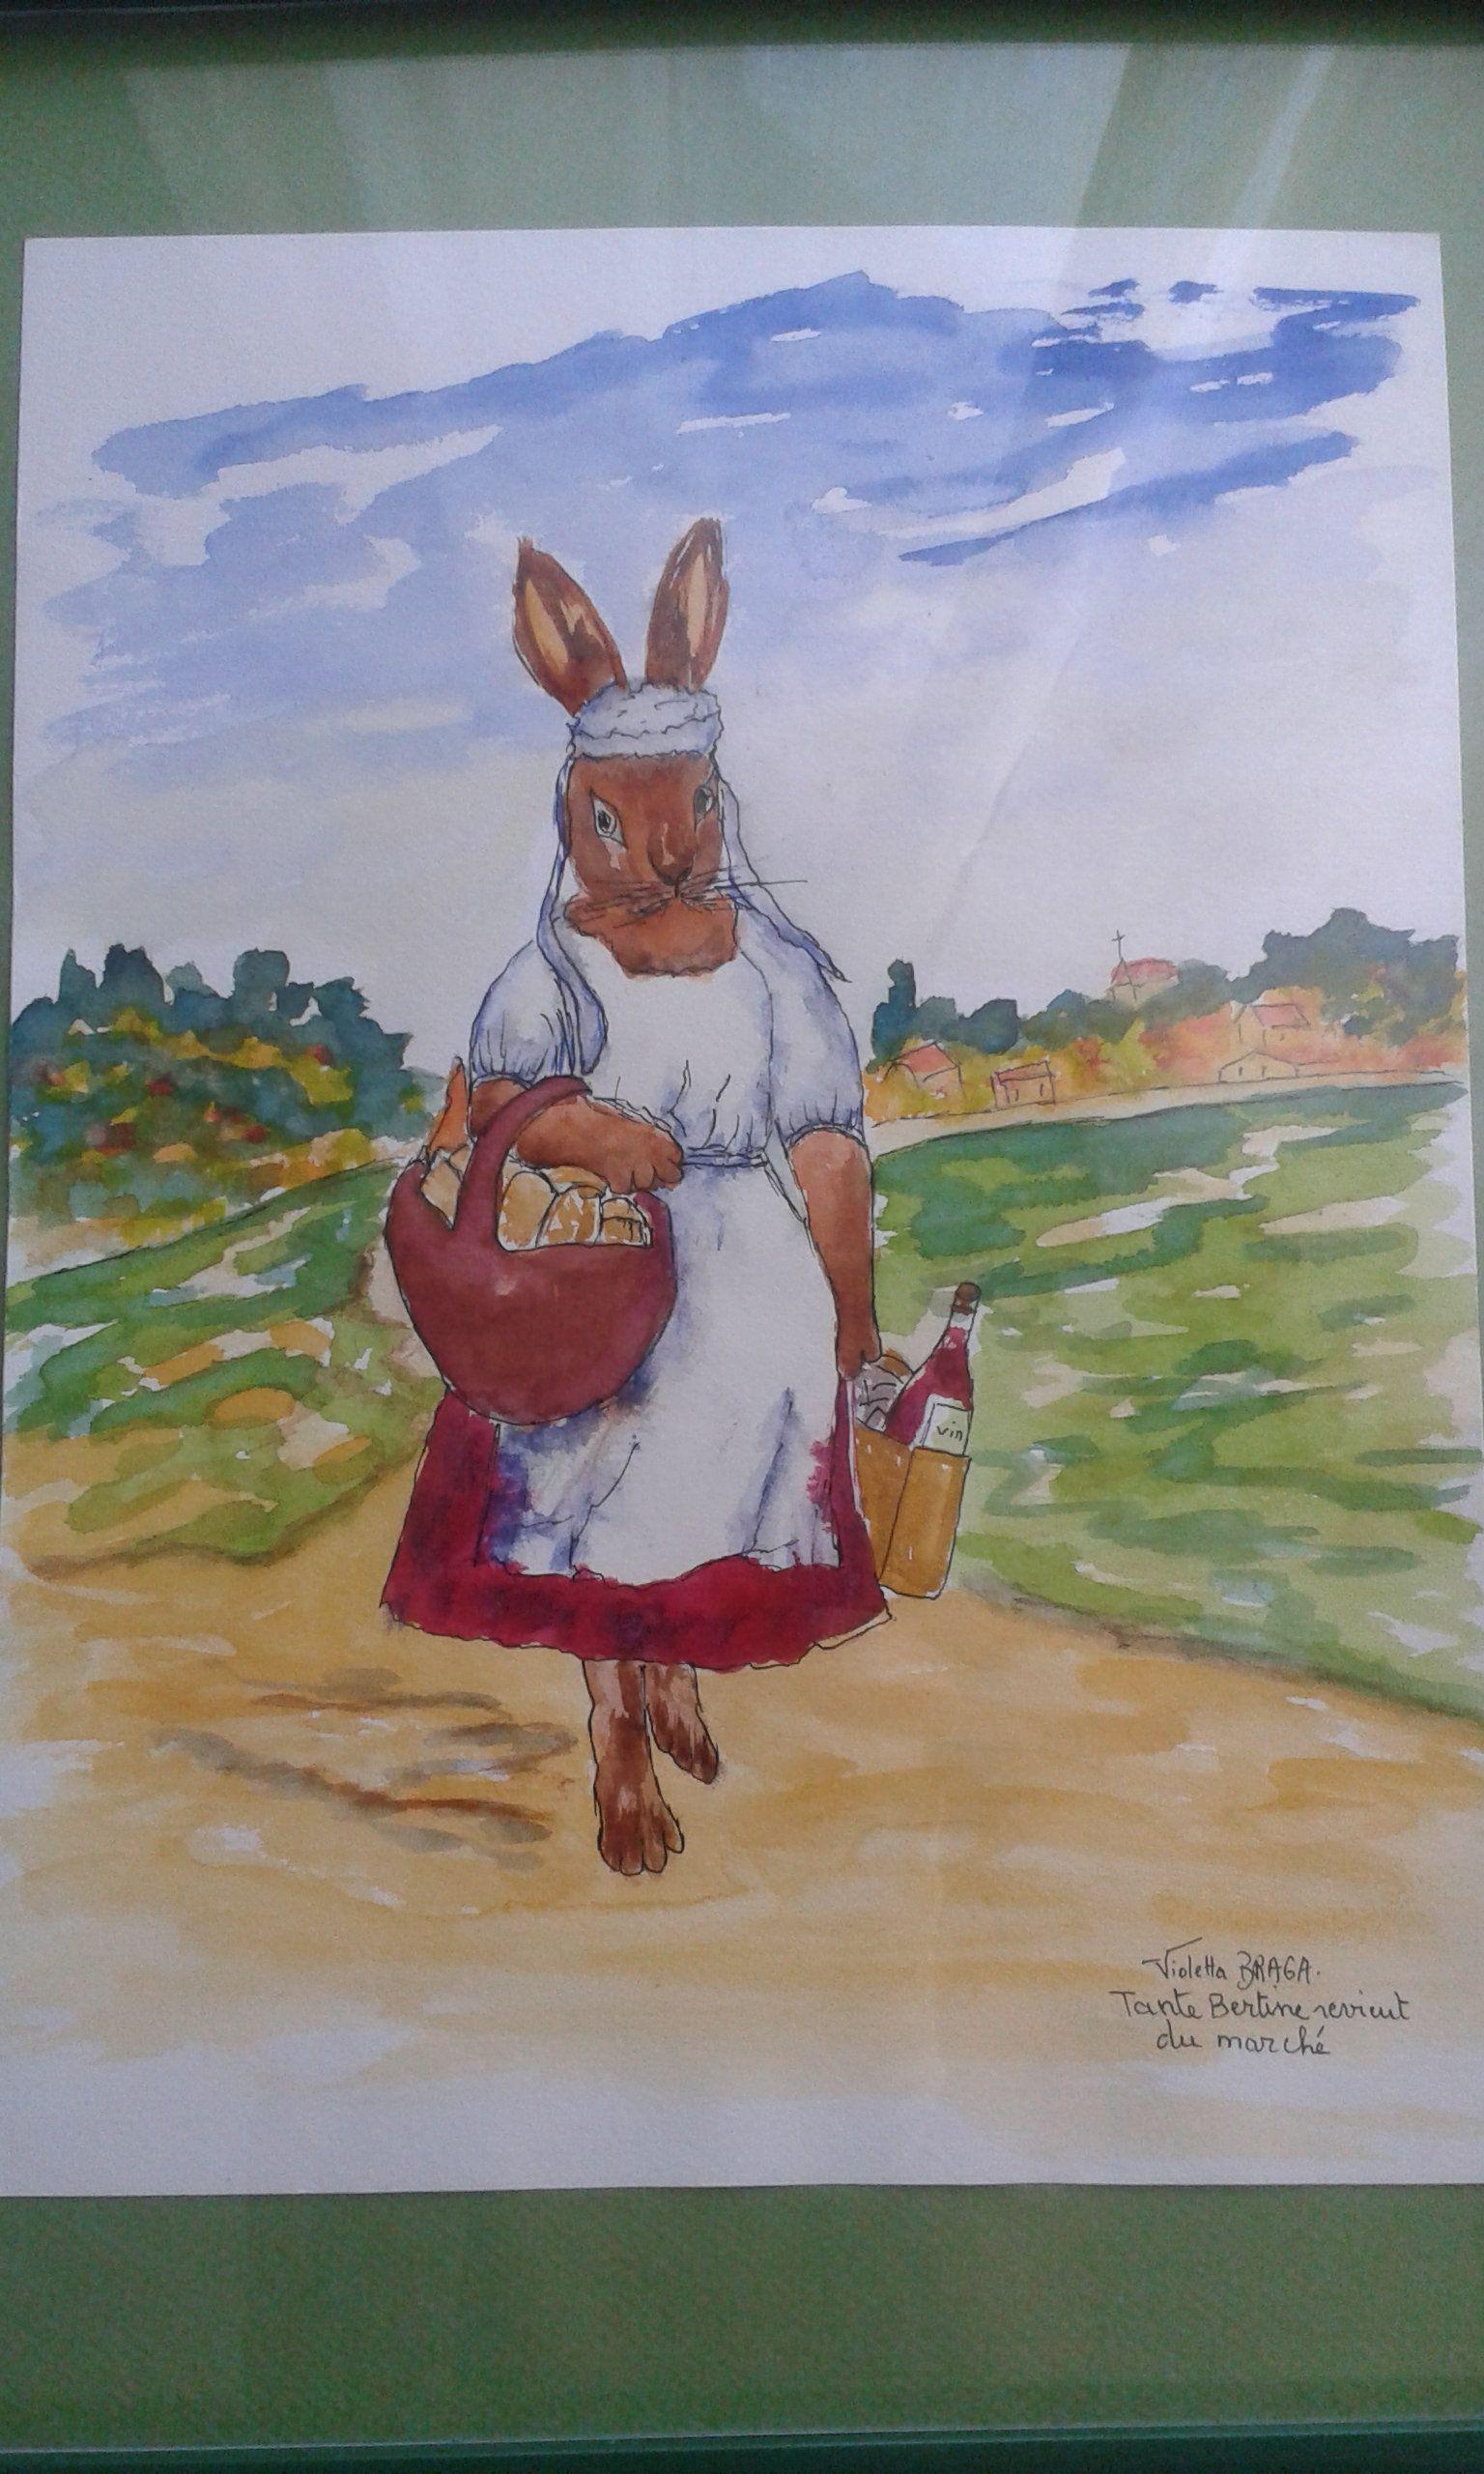 Aquarelle Illustree Lapin Reserve Defi Juin 2019 Peinture A L Eau